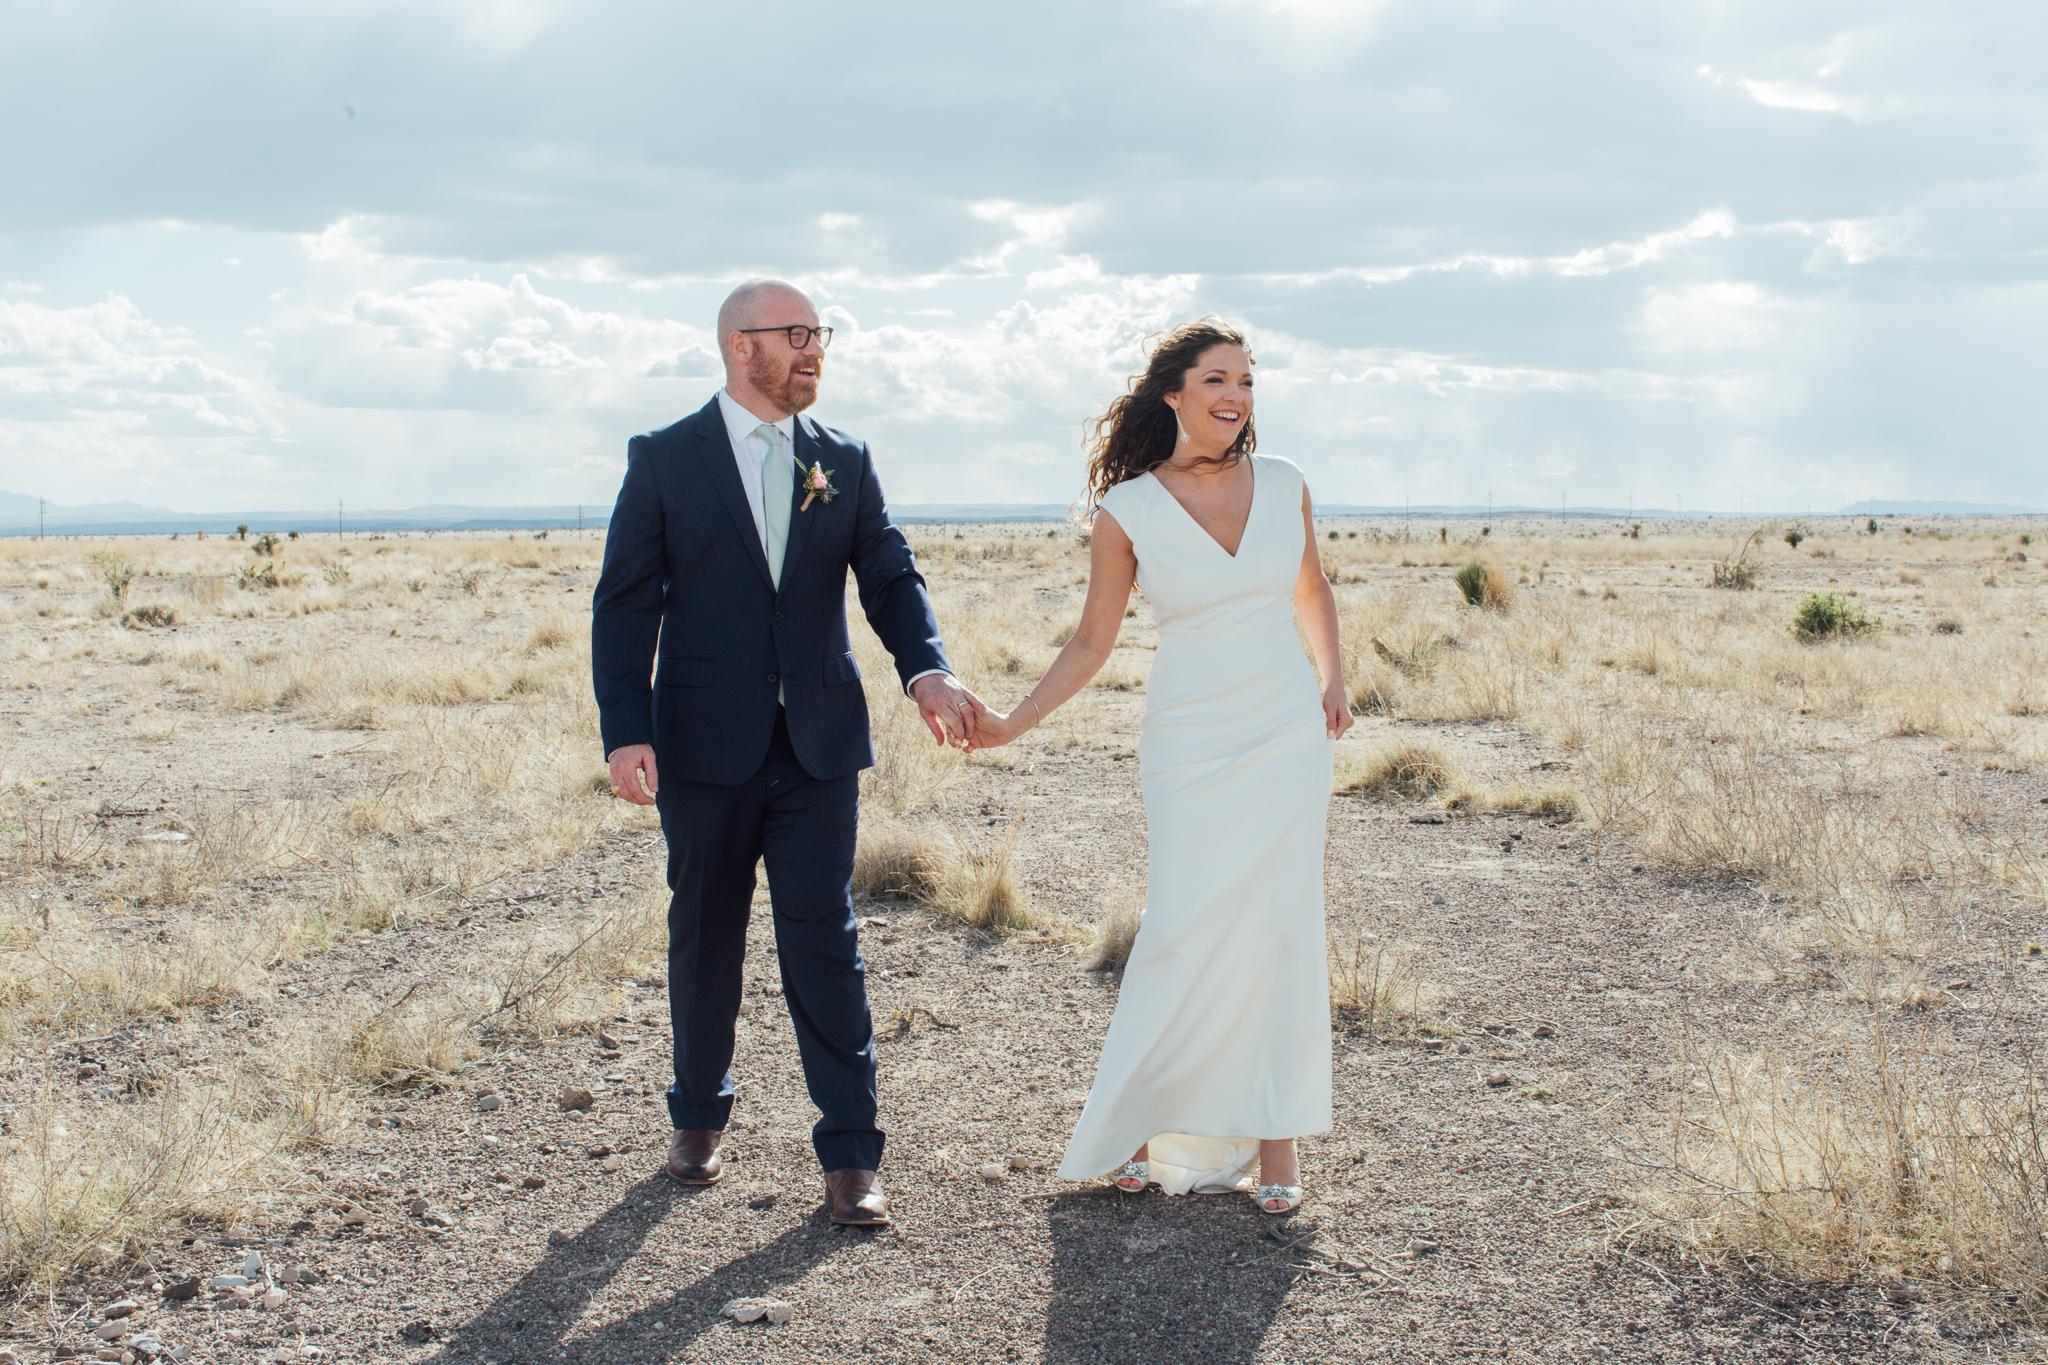 Marfa-Wedding-Photographers-23.jpg